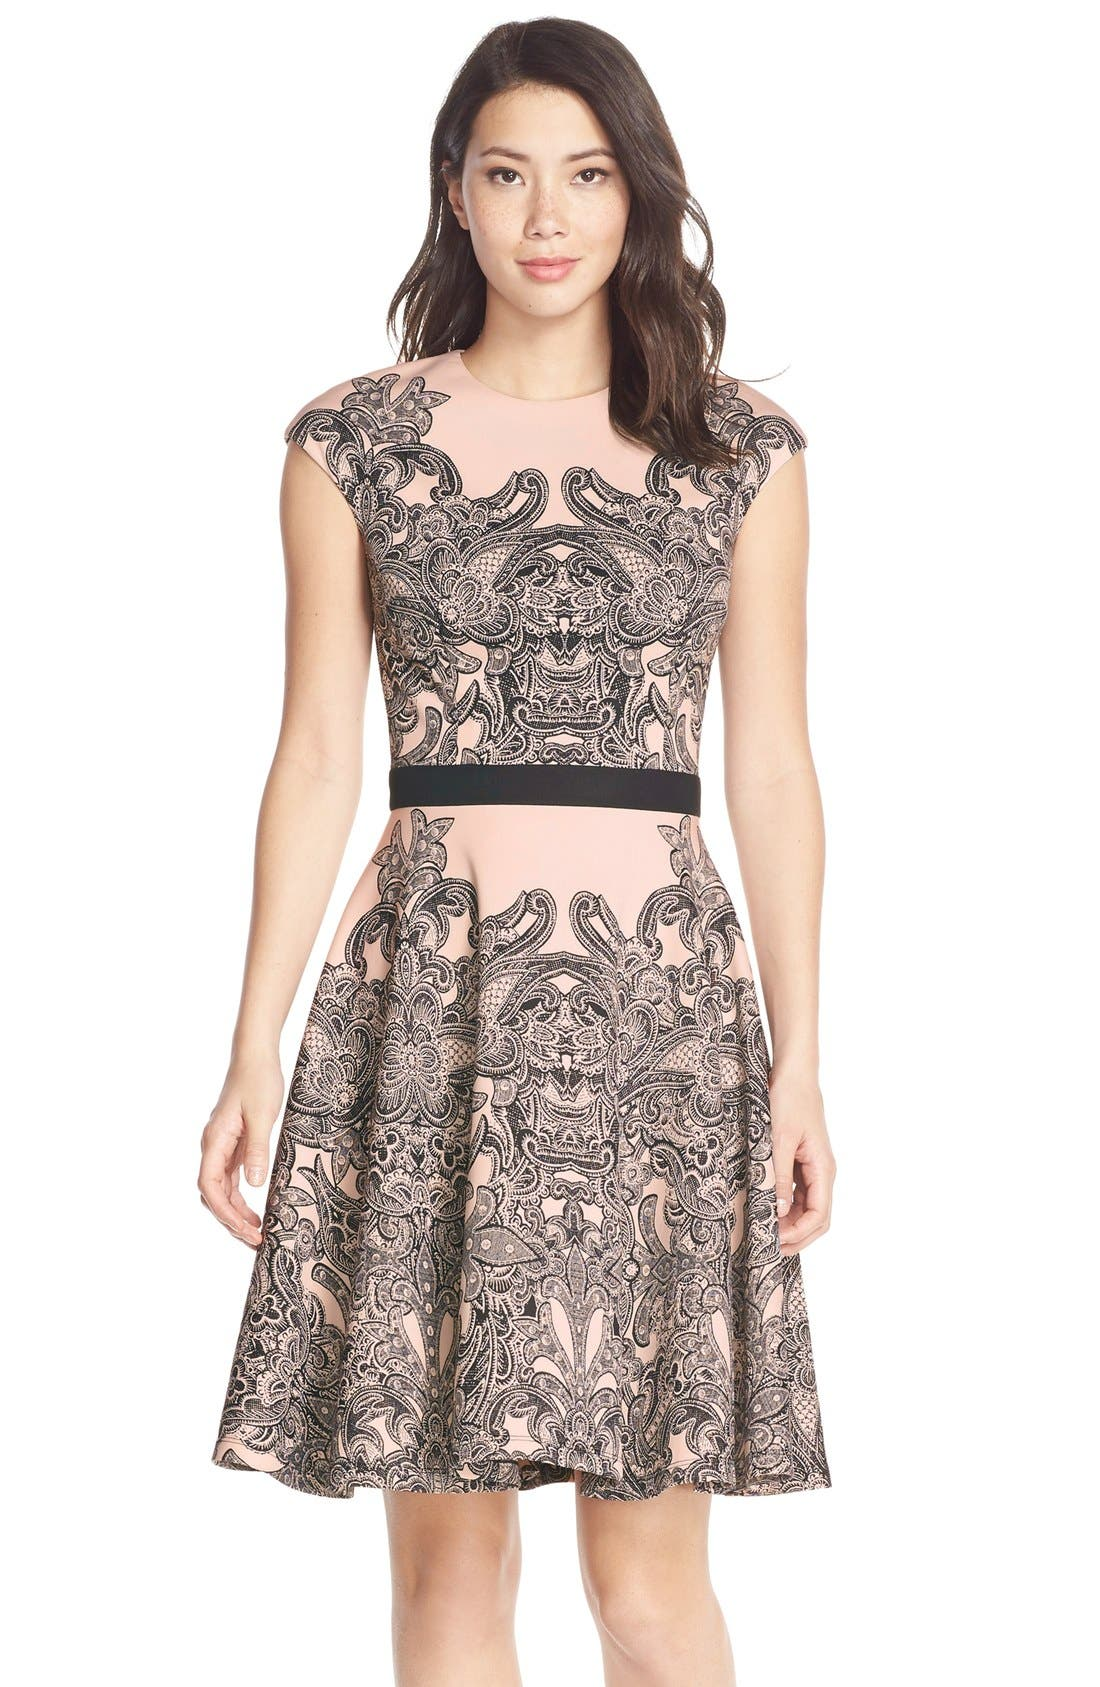 Alternate Image 1 Selected - MaggyLondon Print Scuba Fit & Flare Dress (Regular & Petite)